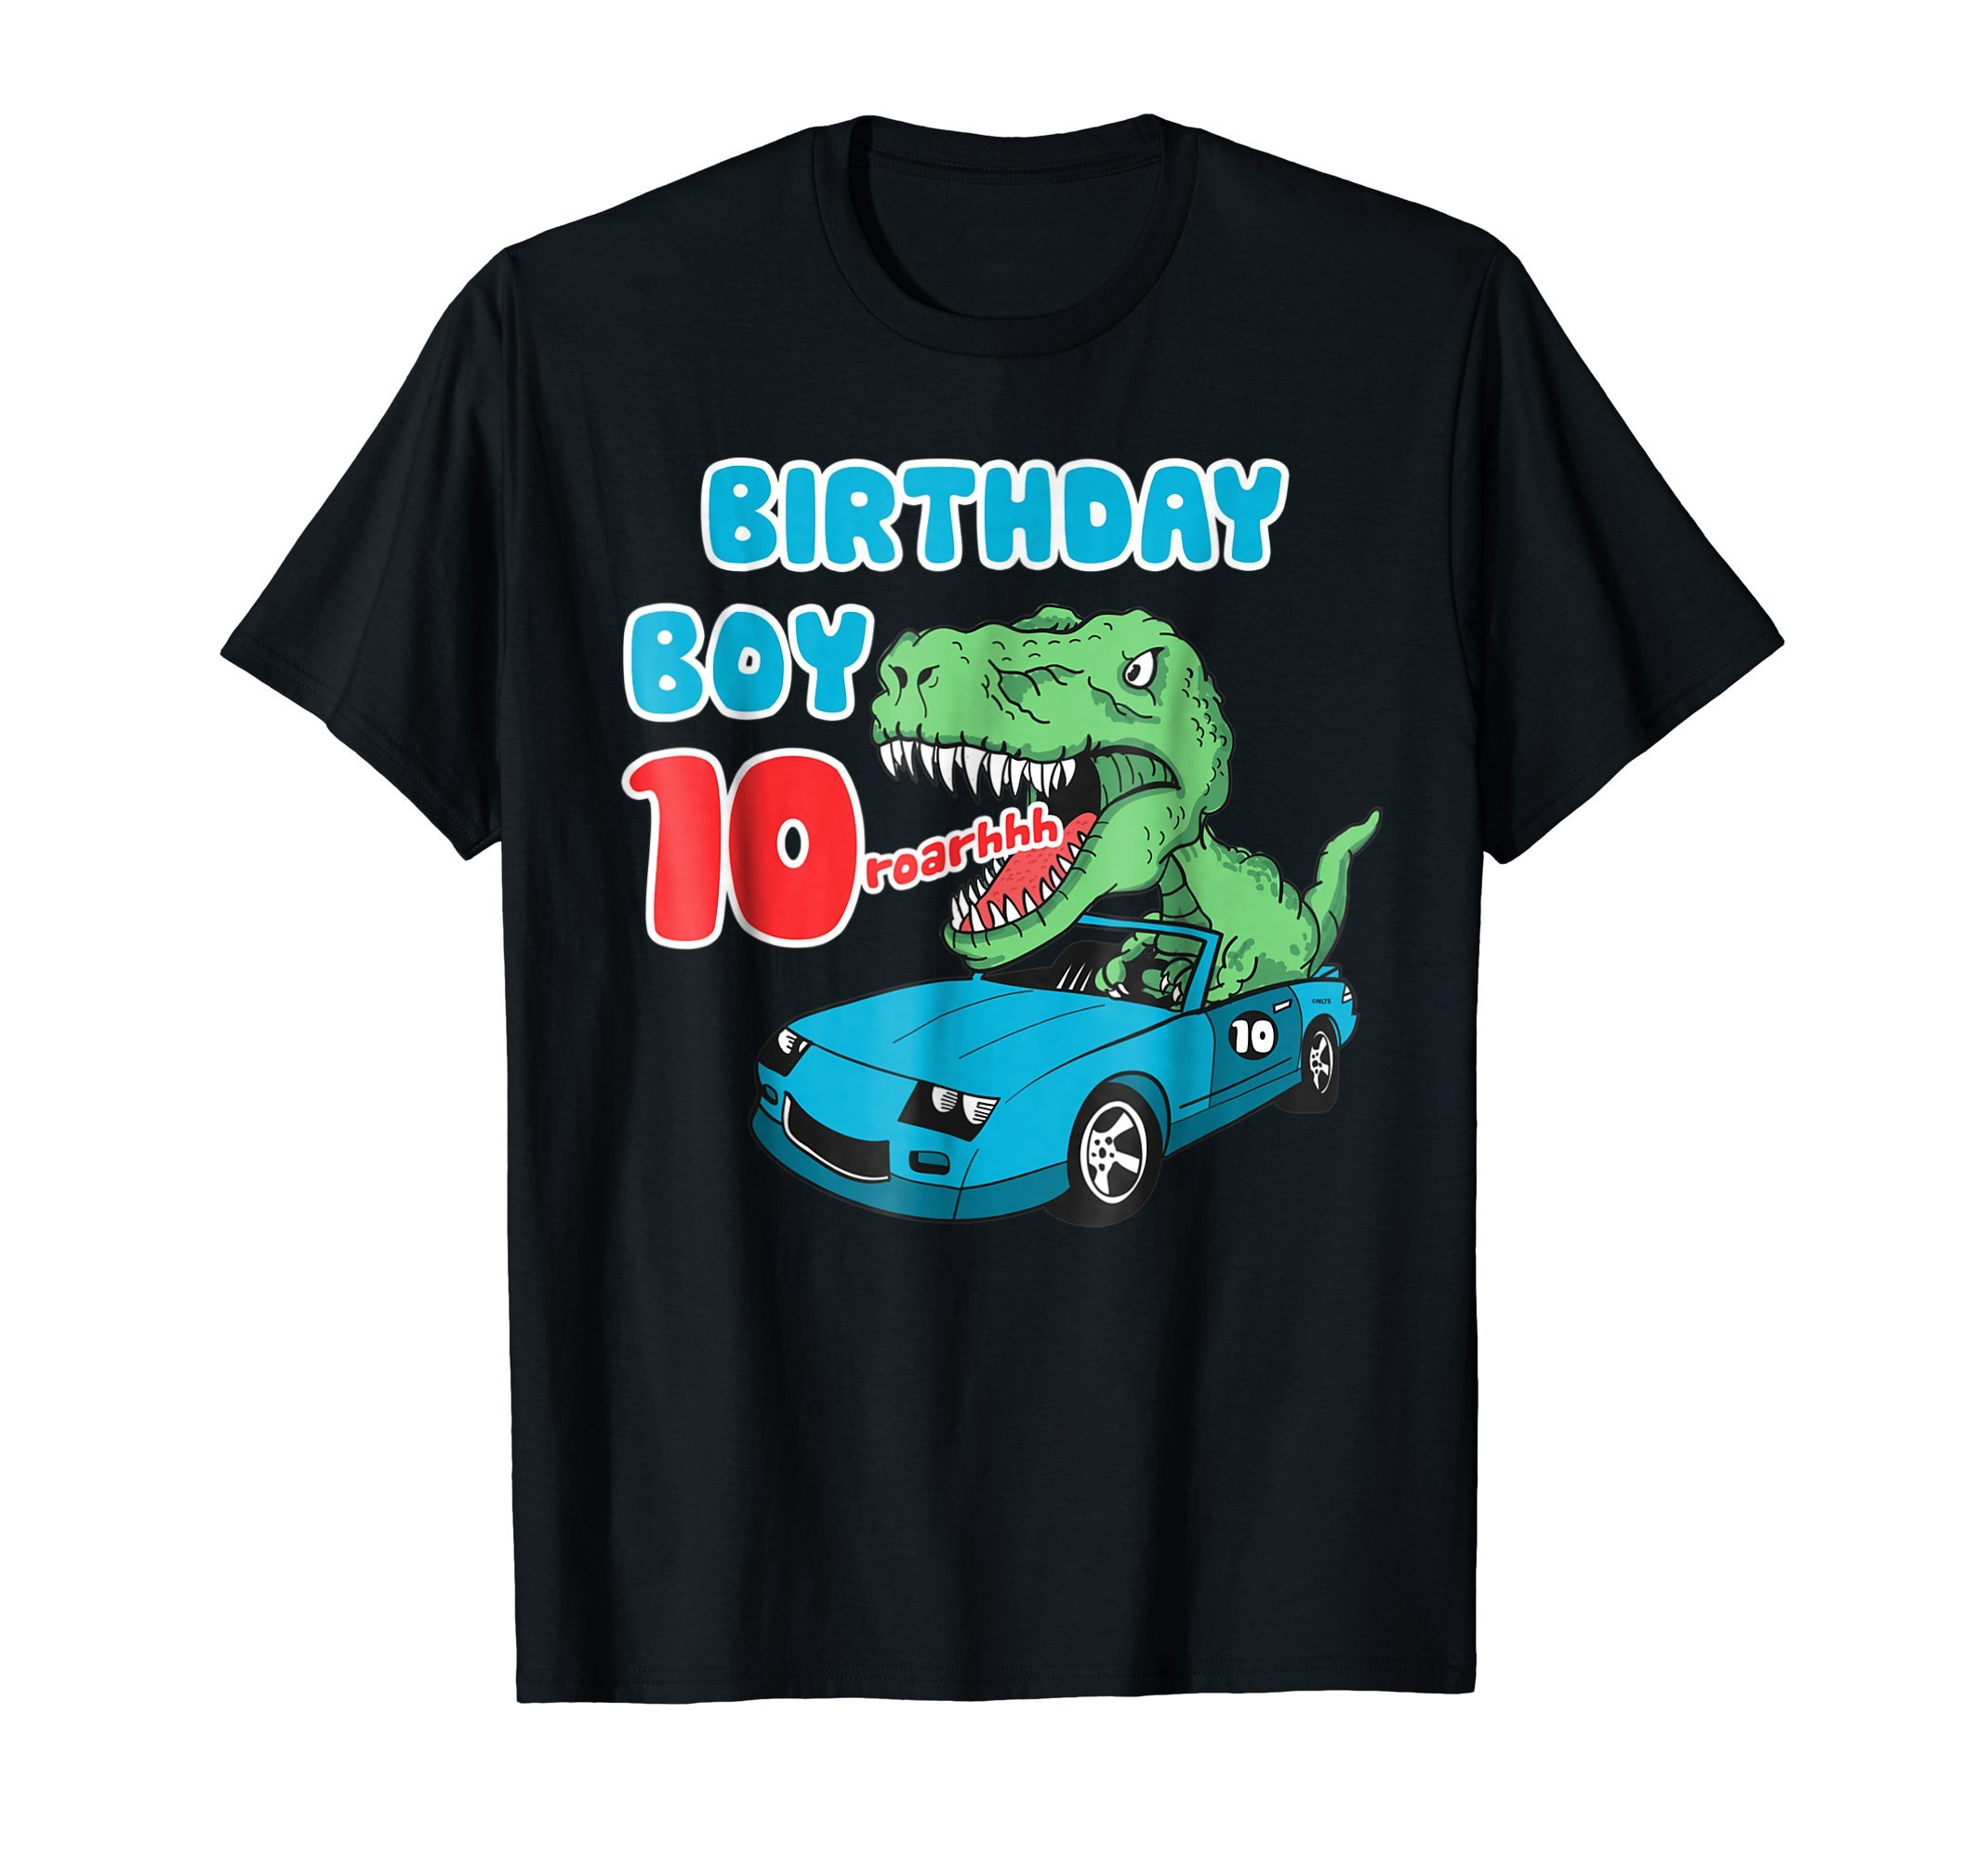 Dinosaur-Racer-Birthday-Boy-10th-Birthday-Fun-Humor-T-Shirt